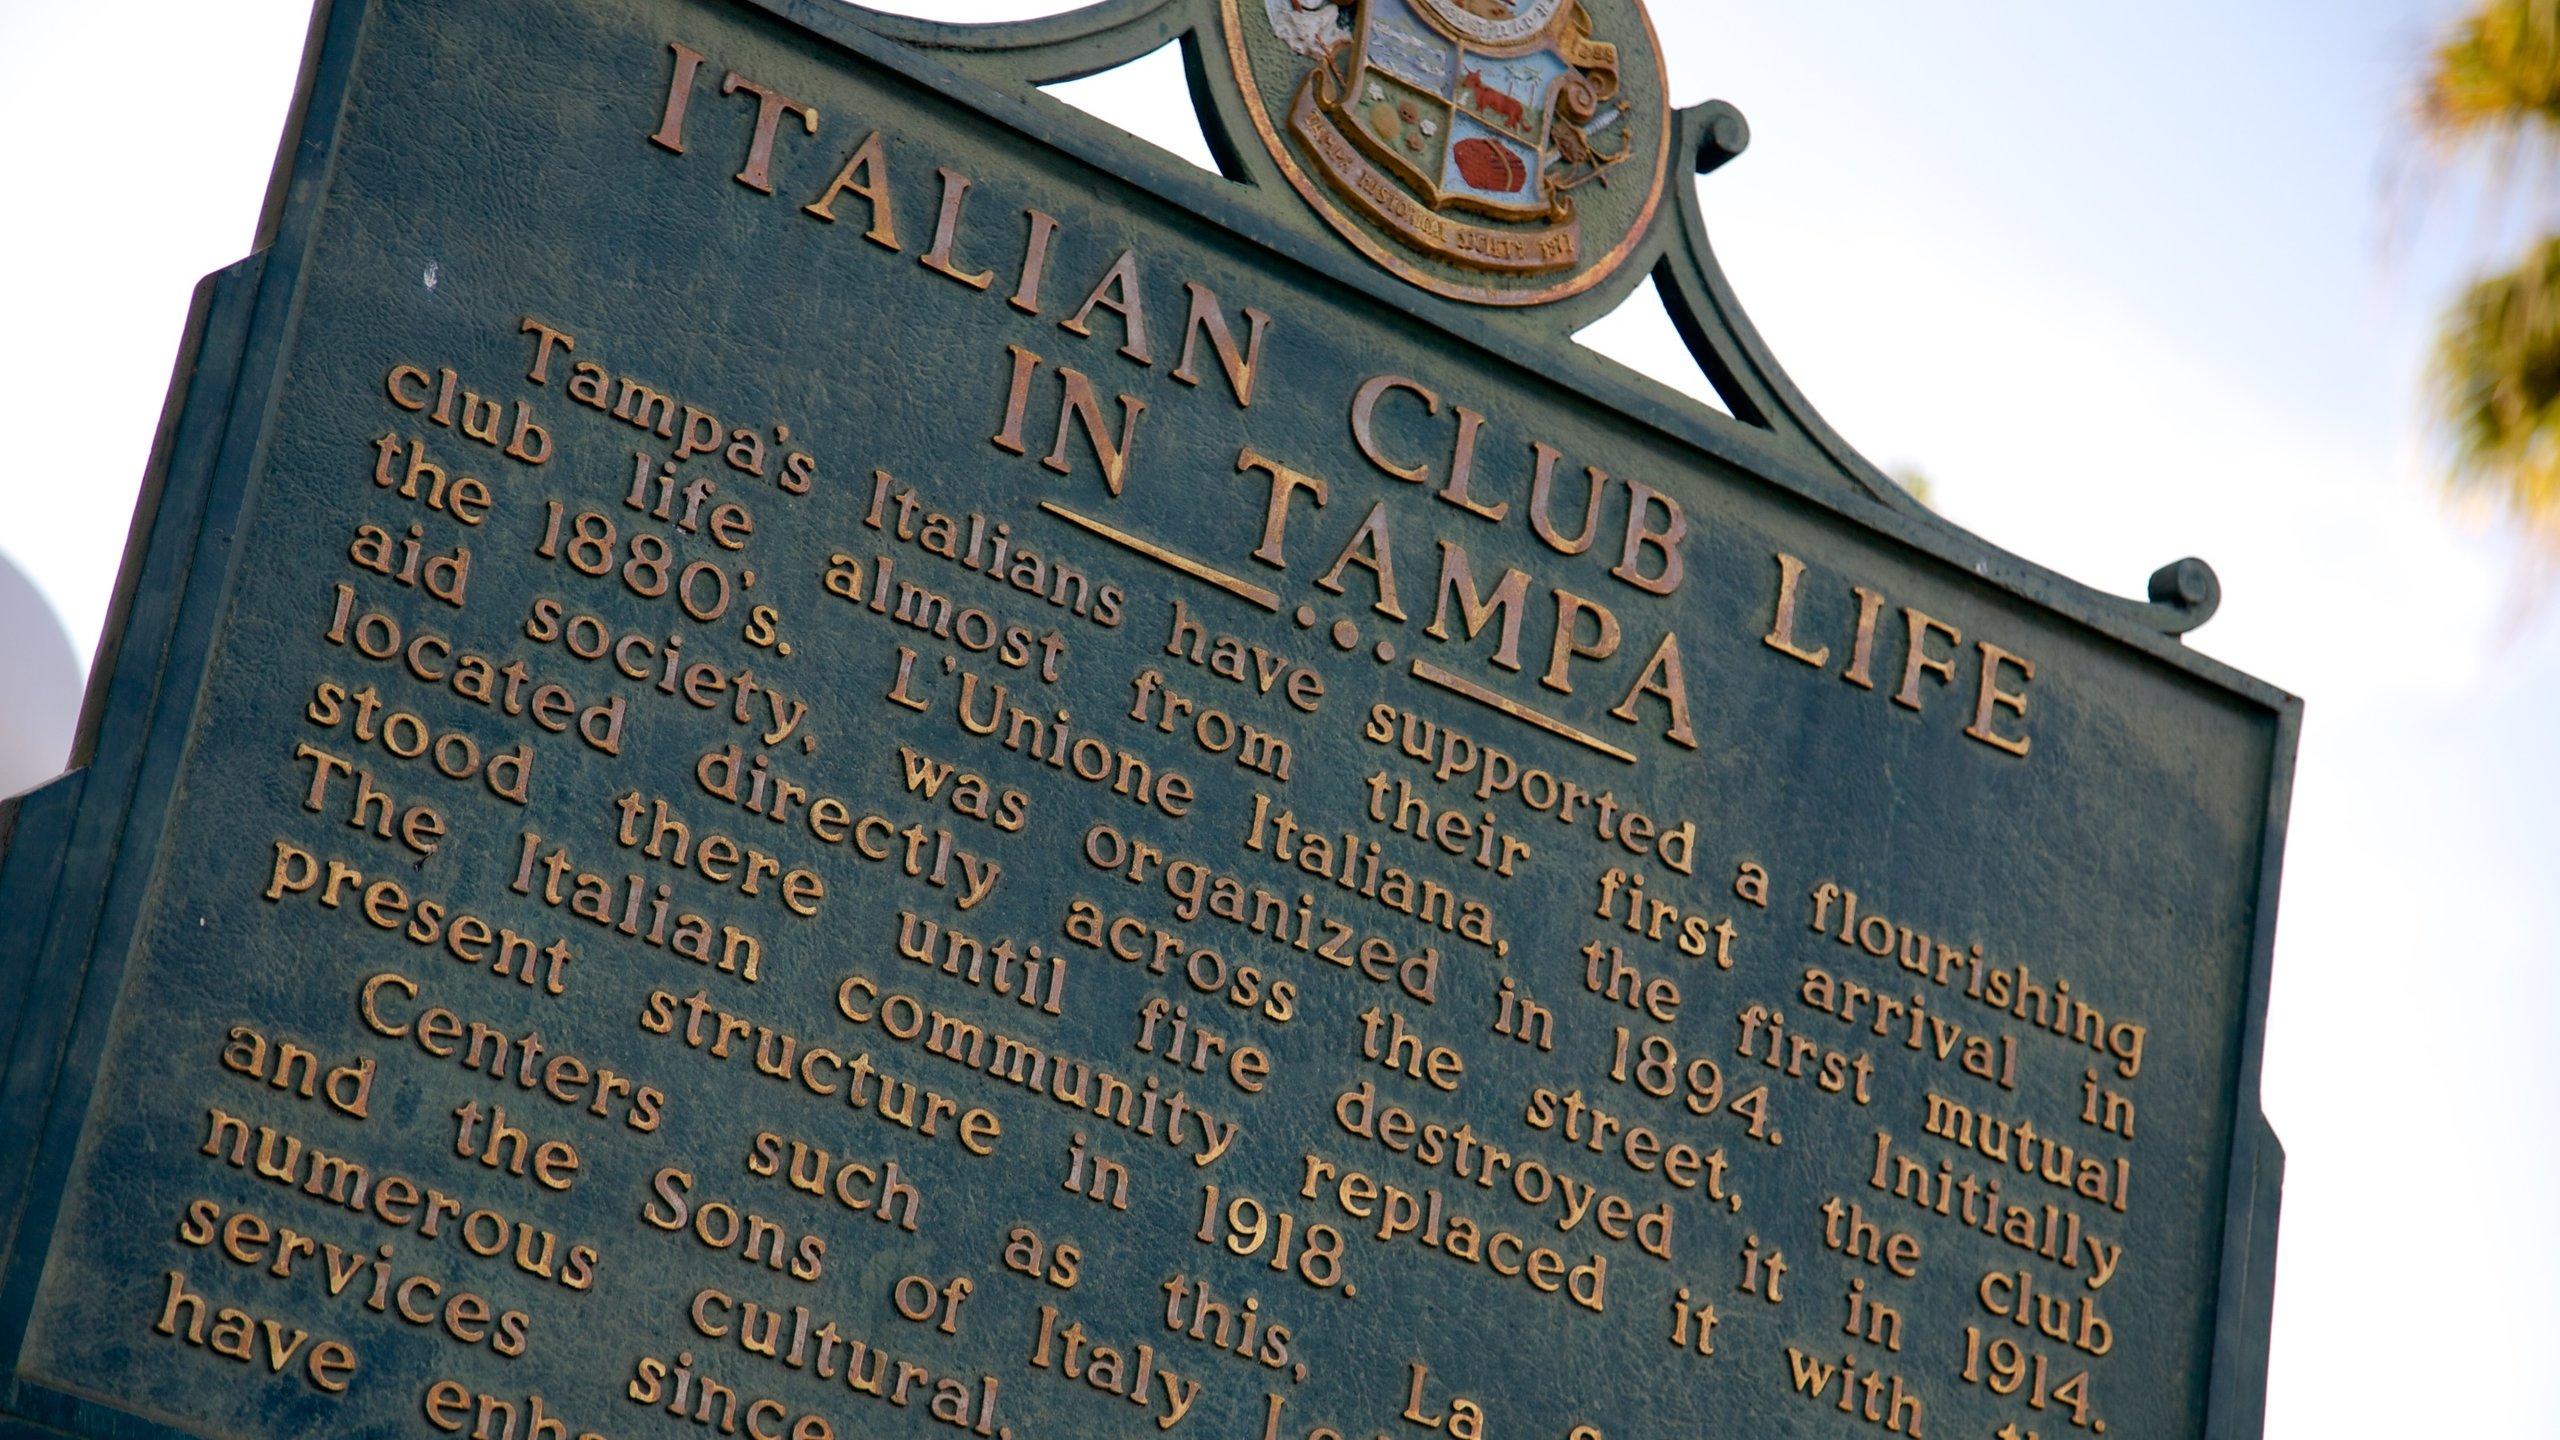 East Tampa, Tampa, Florida, United States of America